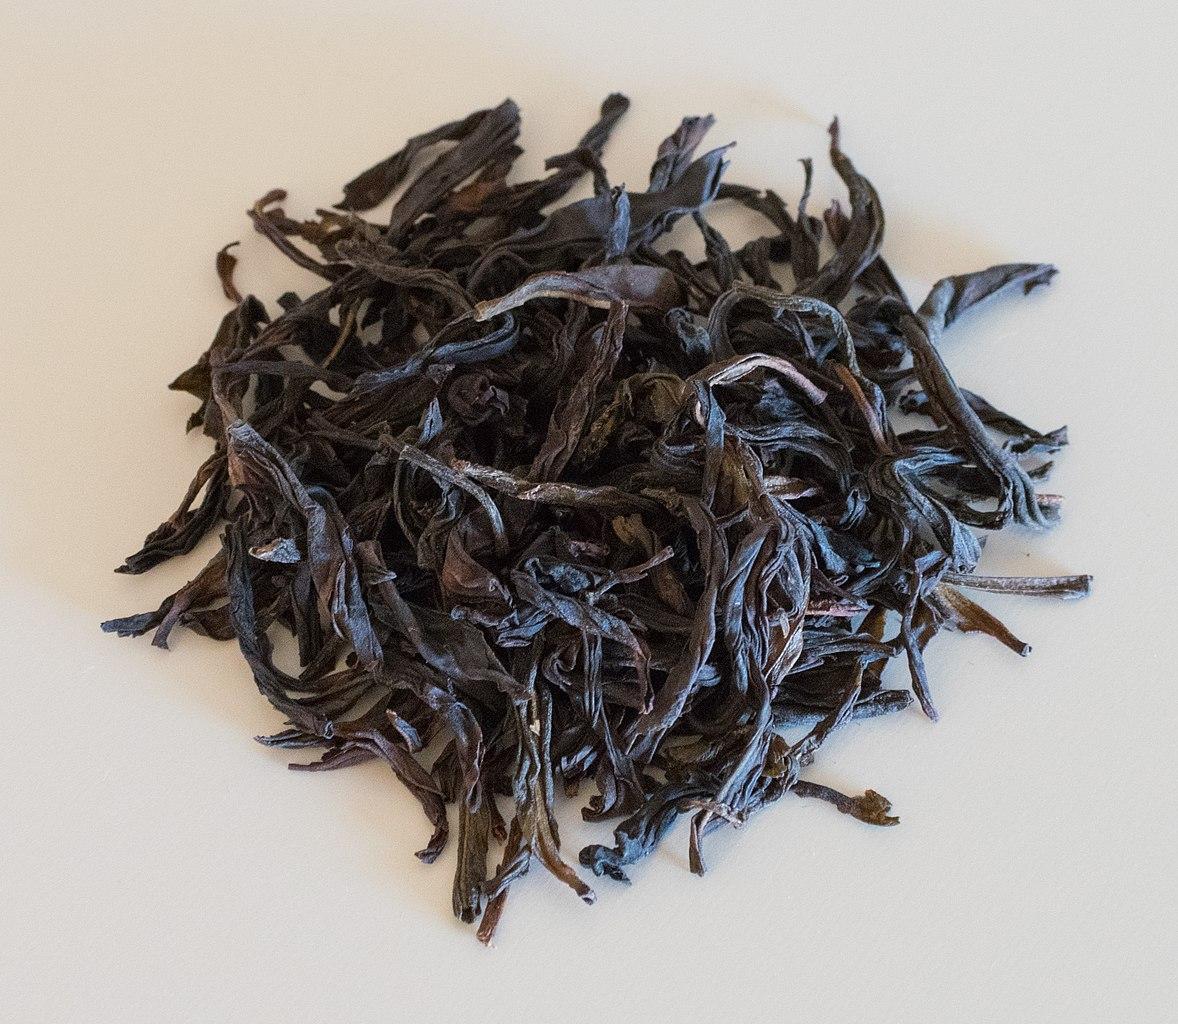 File:Mi Lan Xiang Oolong Tea cropped.jpg - Wikipedia